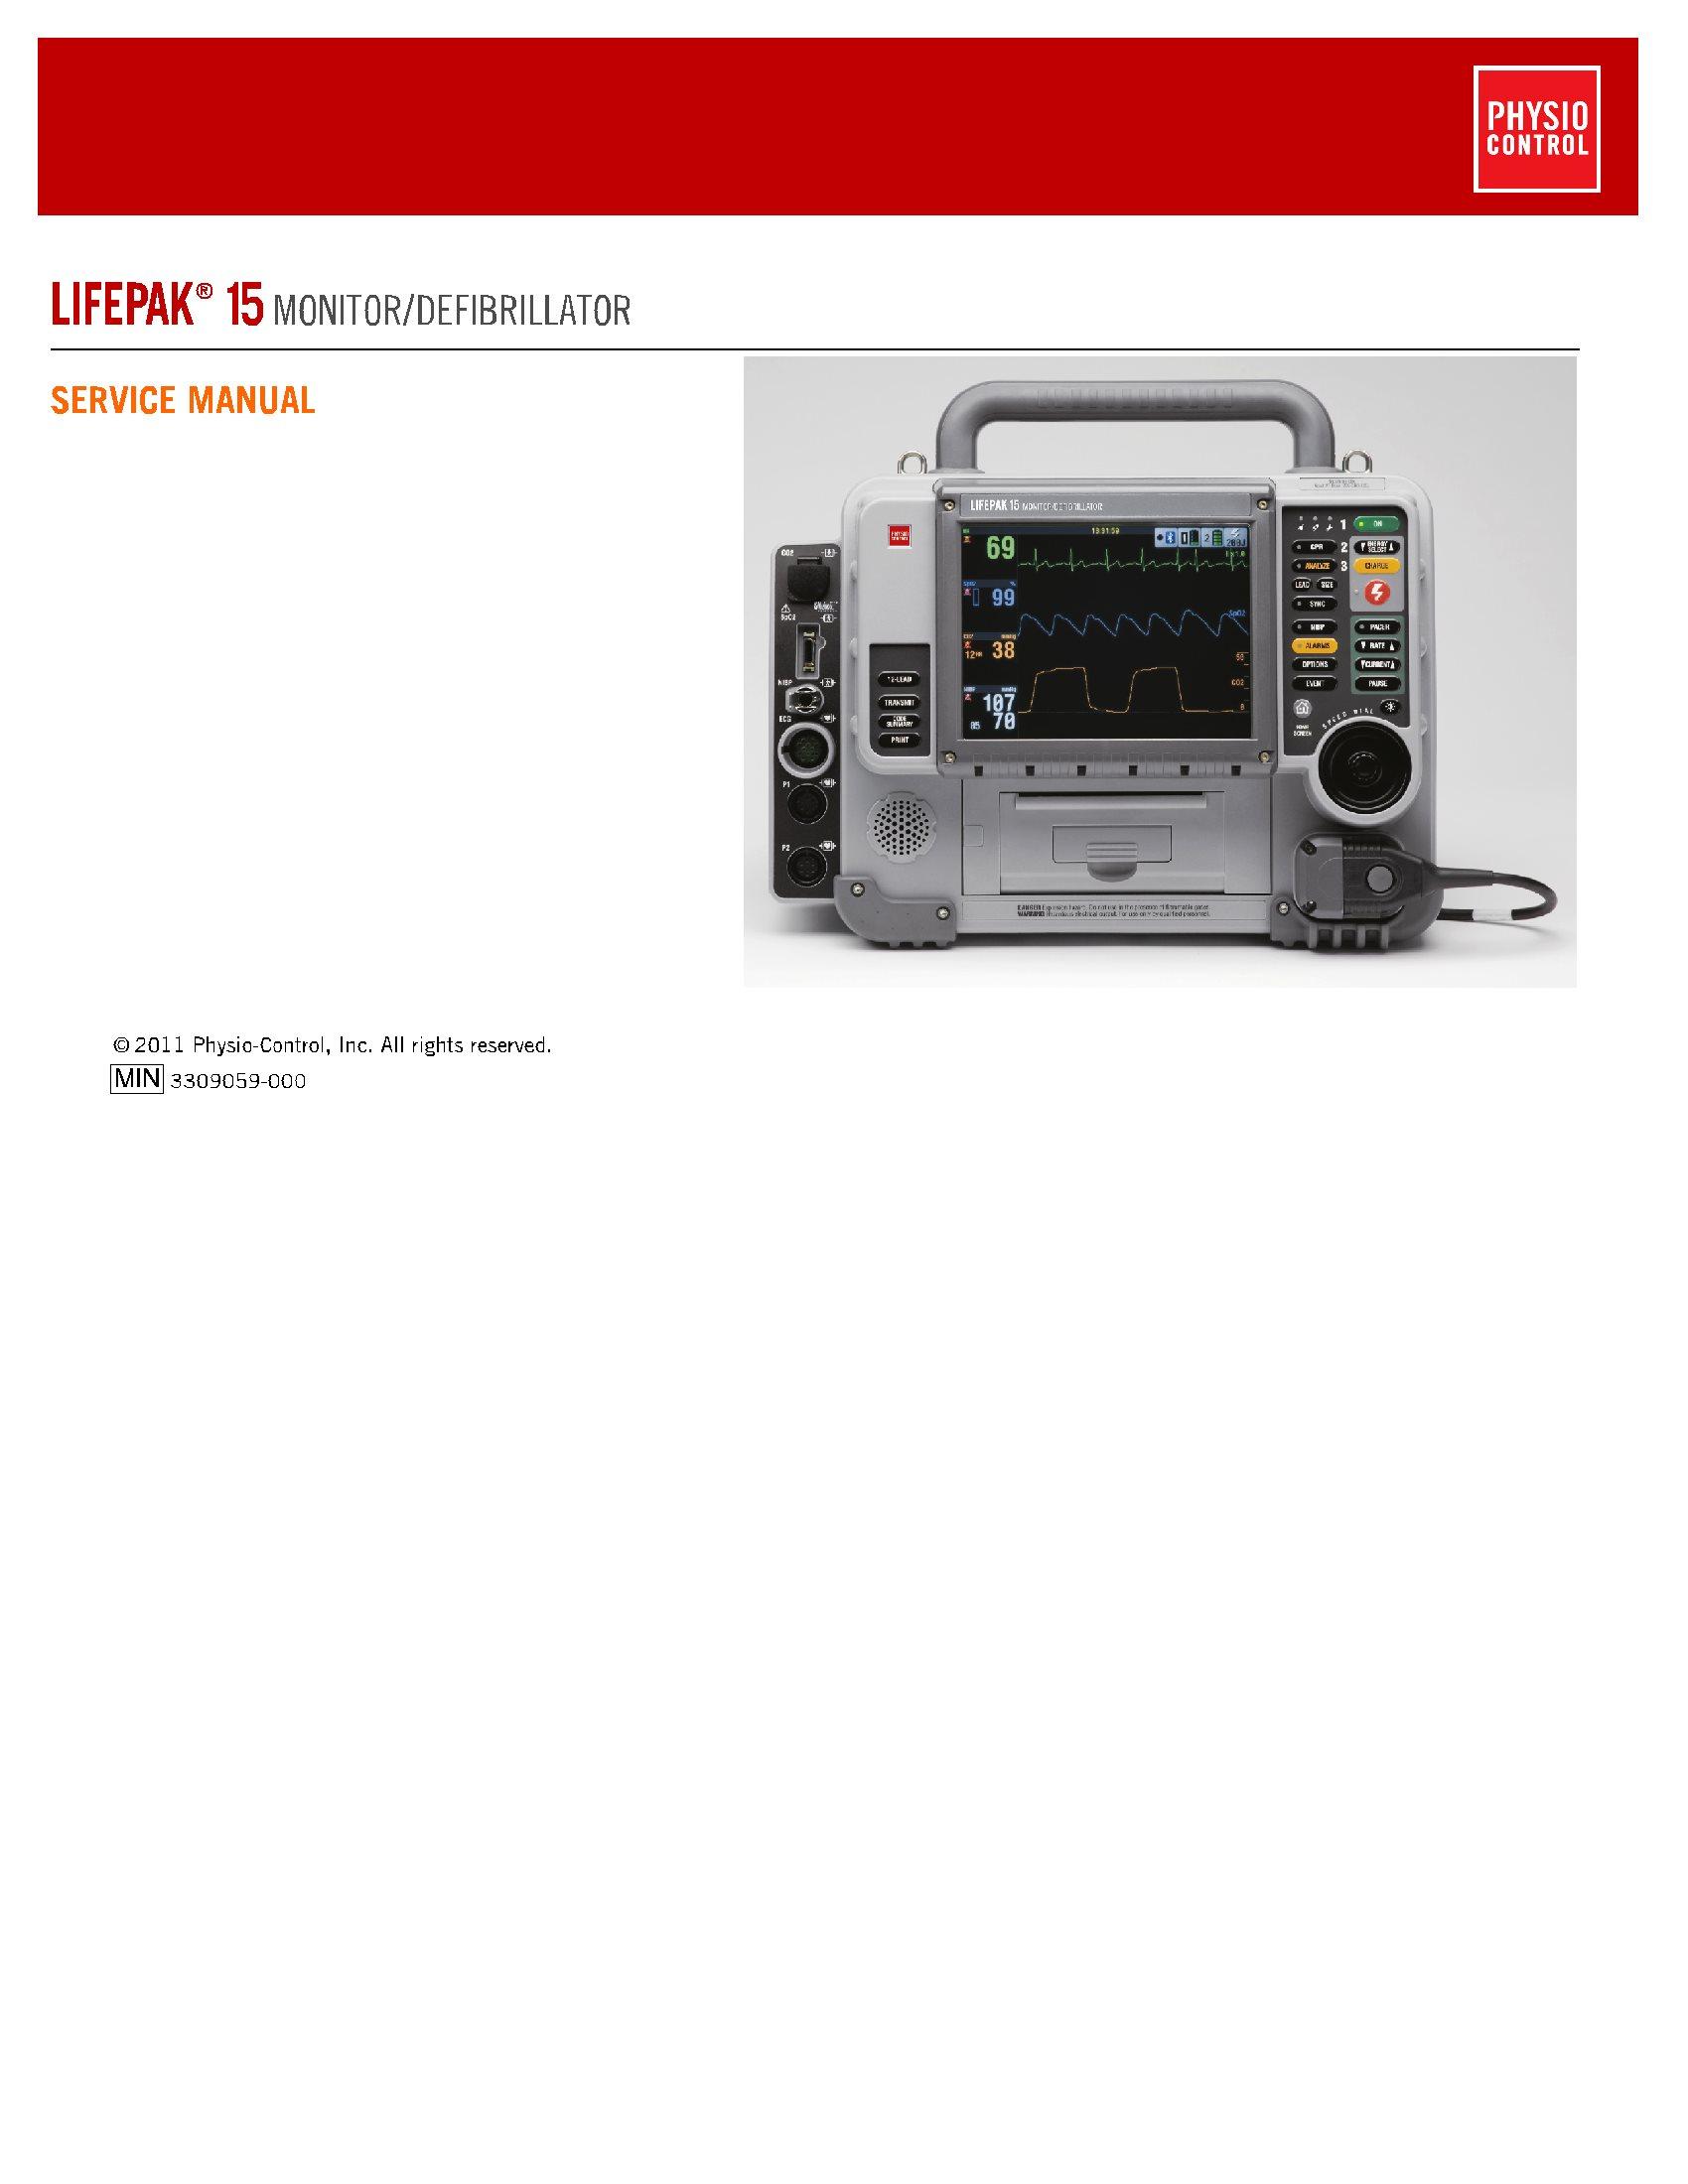 Physio Control Lifepak 15 Service manual